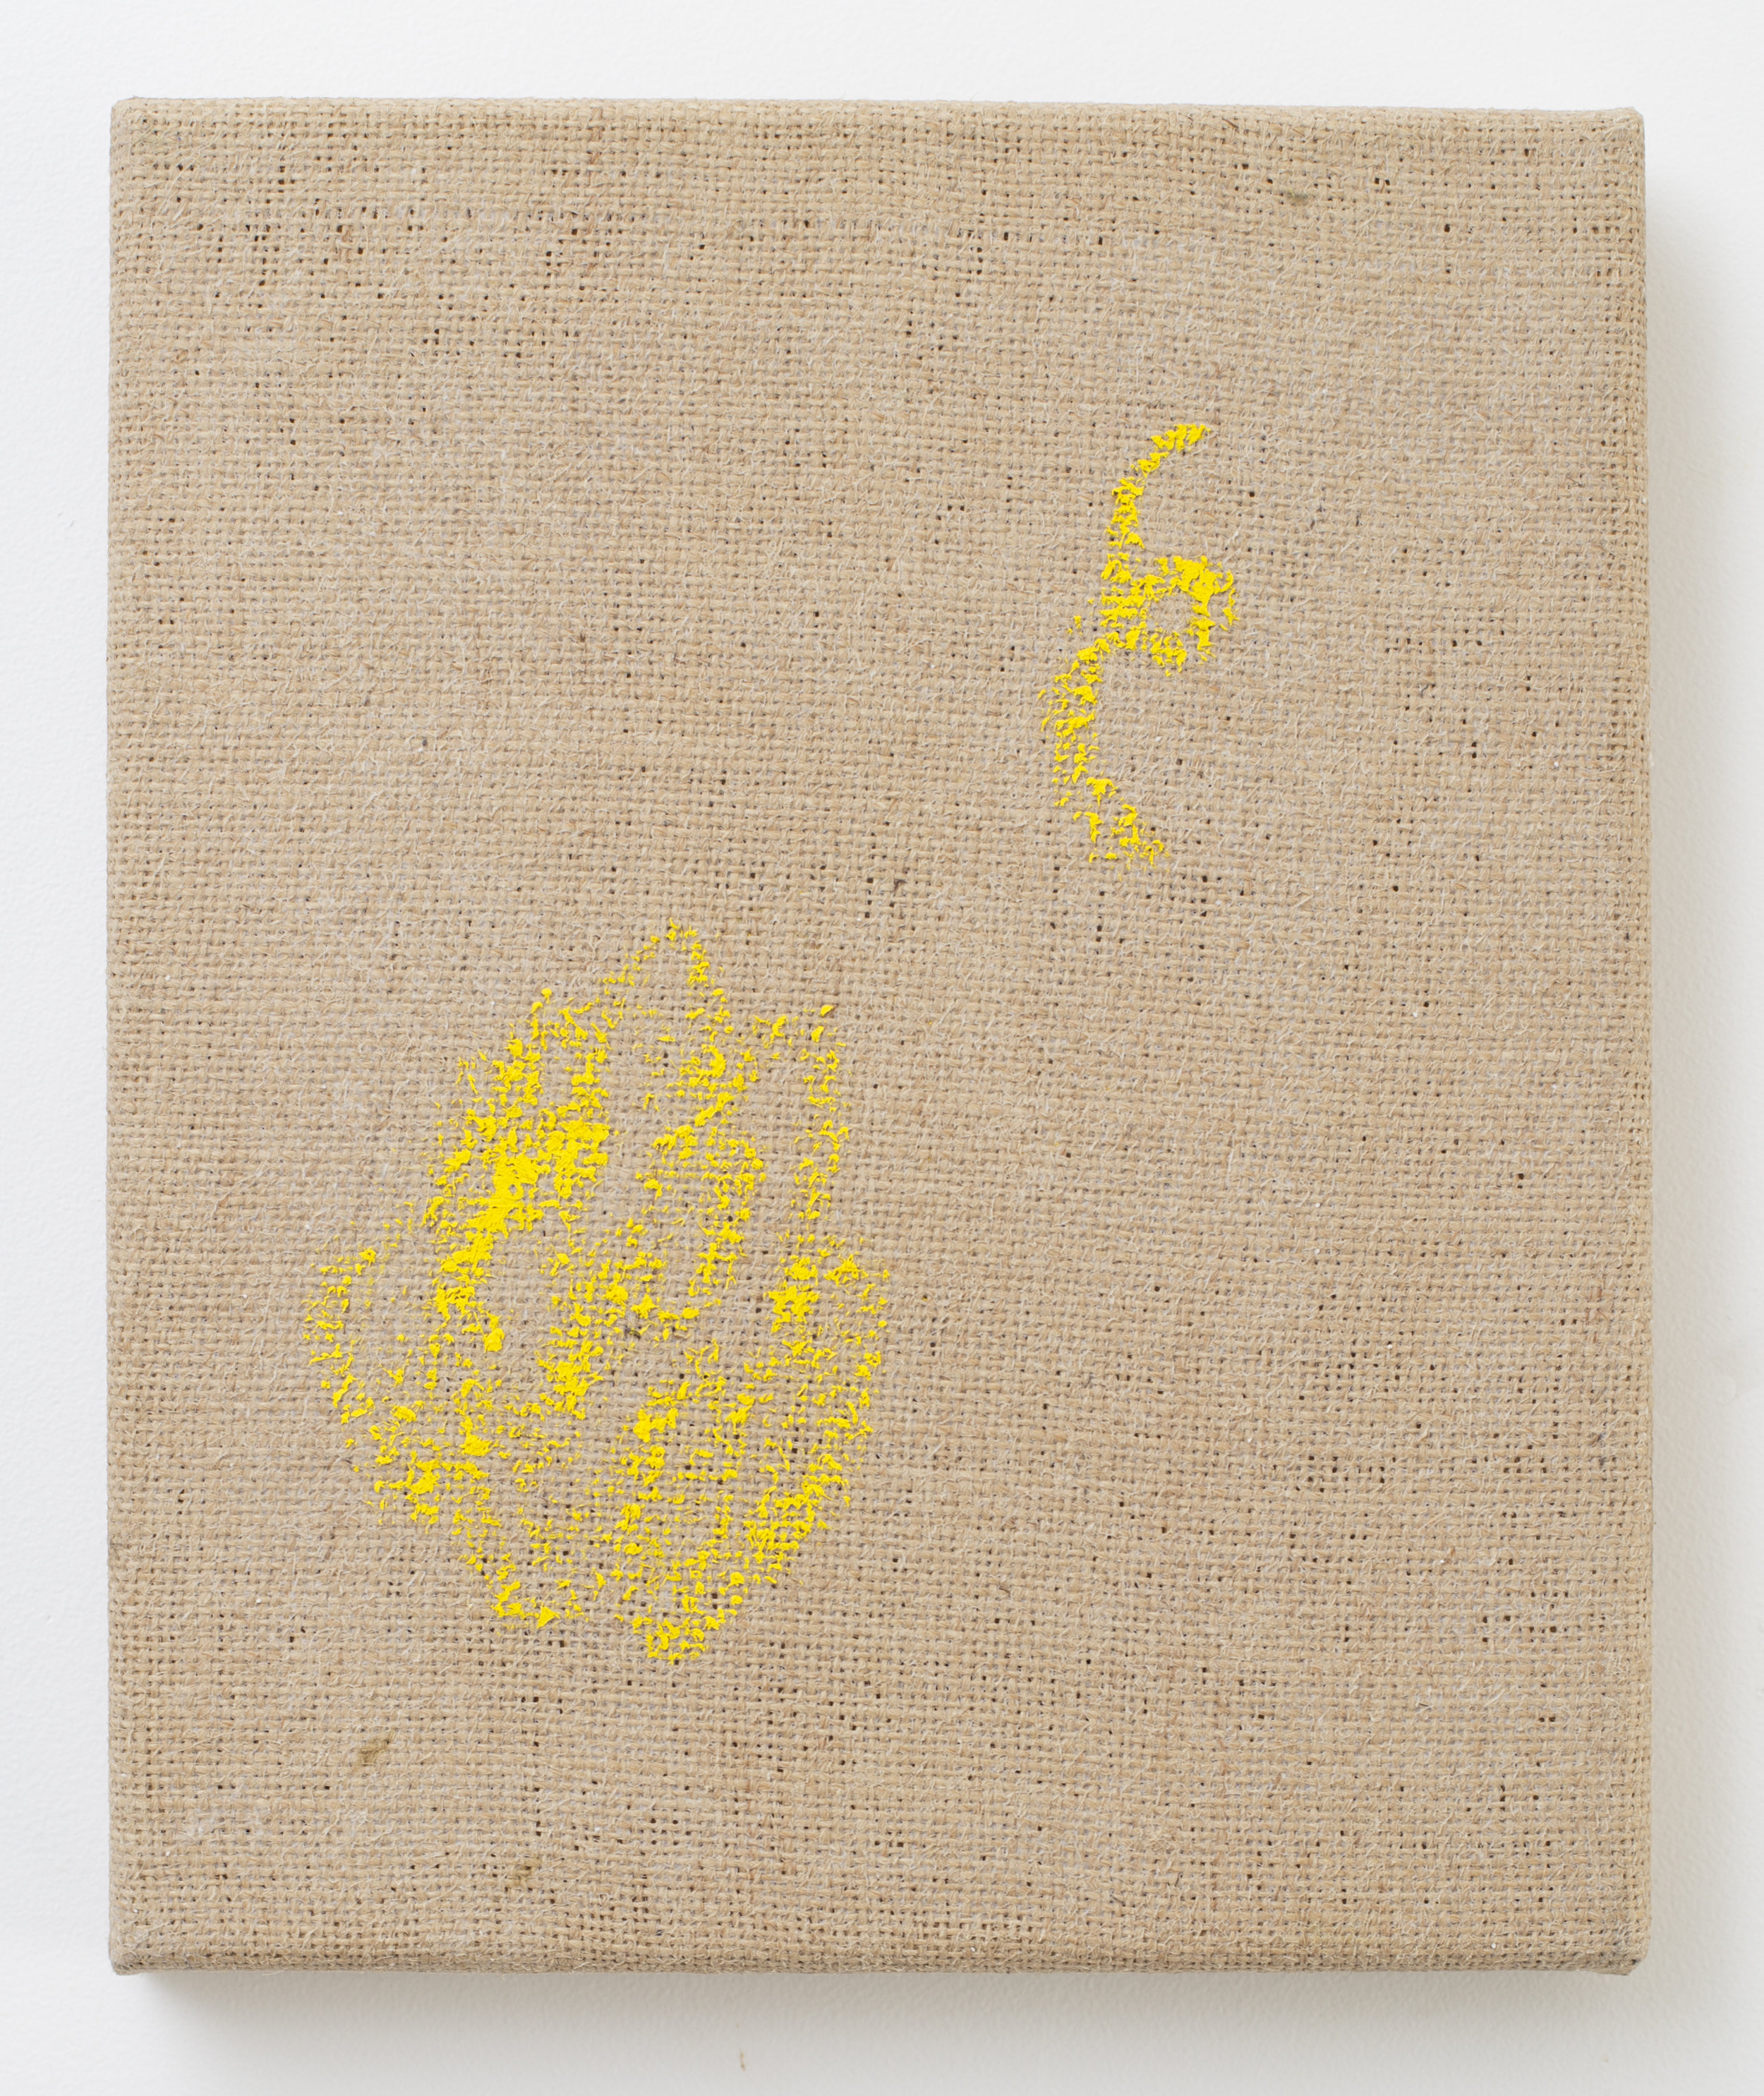 Eleanor Louise Butt, 'Tawarri', oil-stick on jute, 2017, 28 x 23cm.